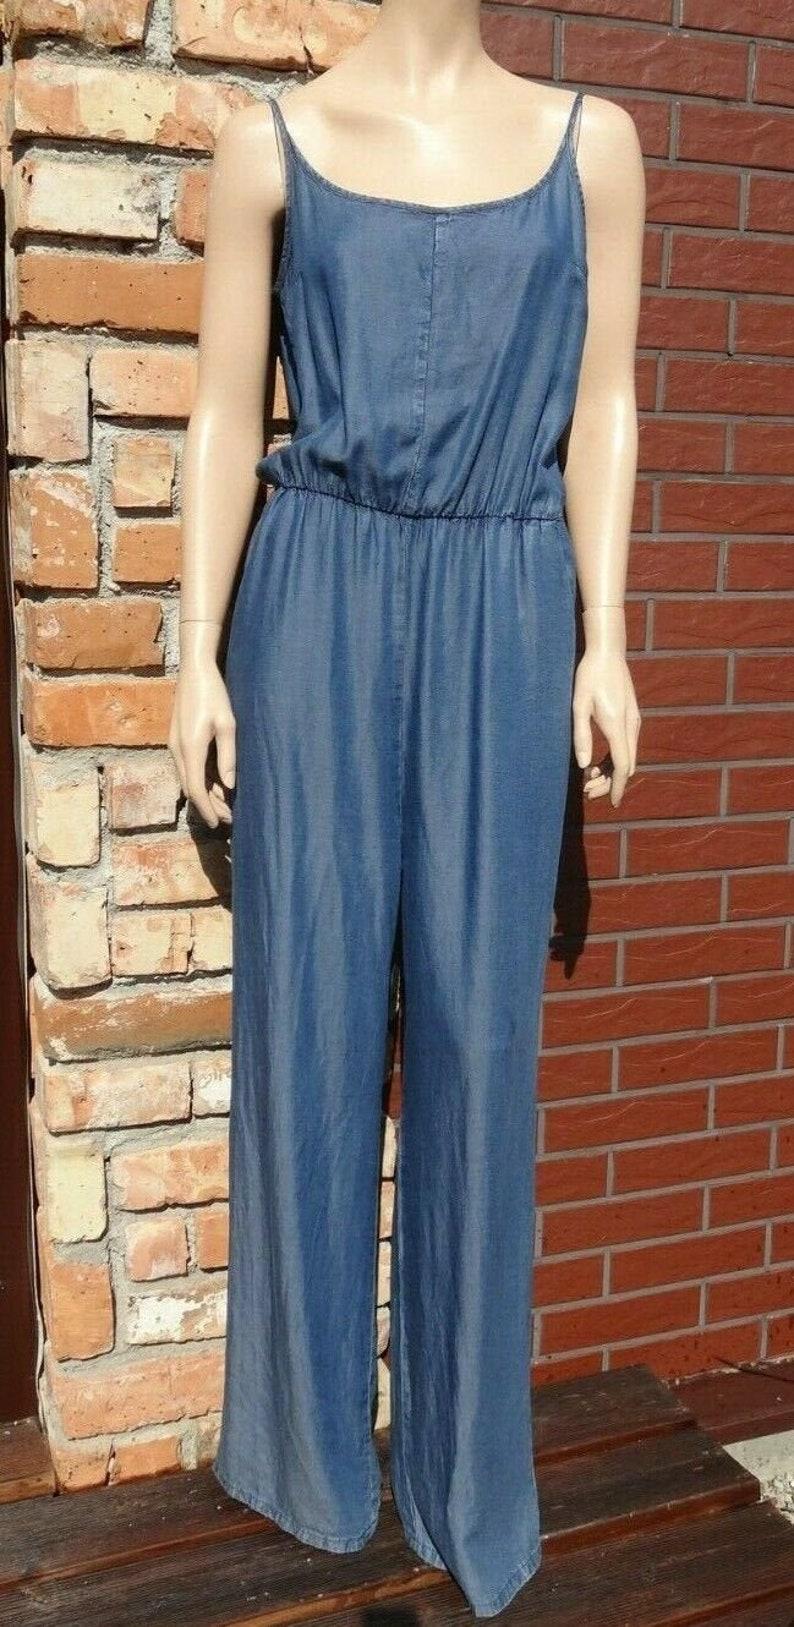 Denim jumpsuit with pockets